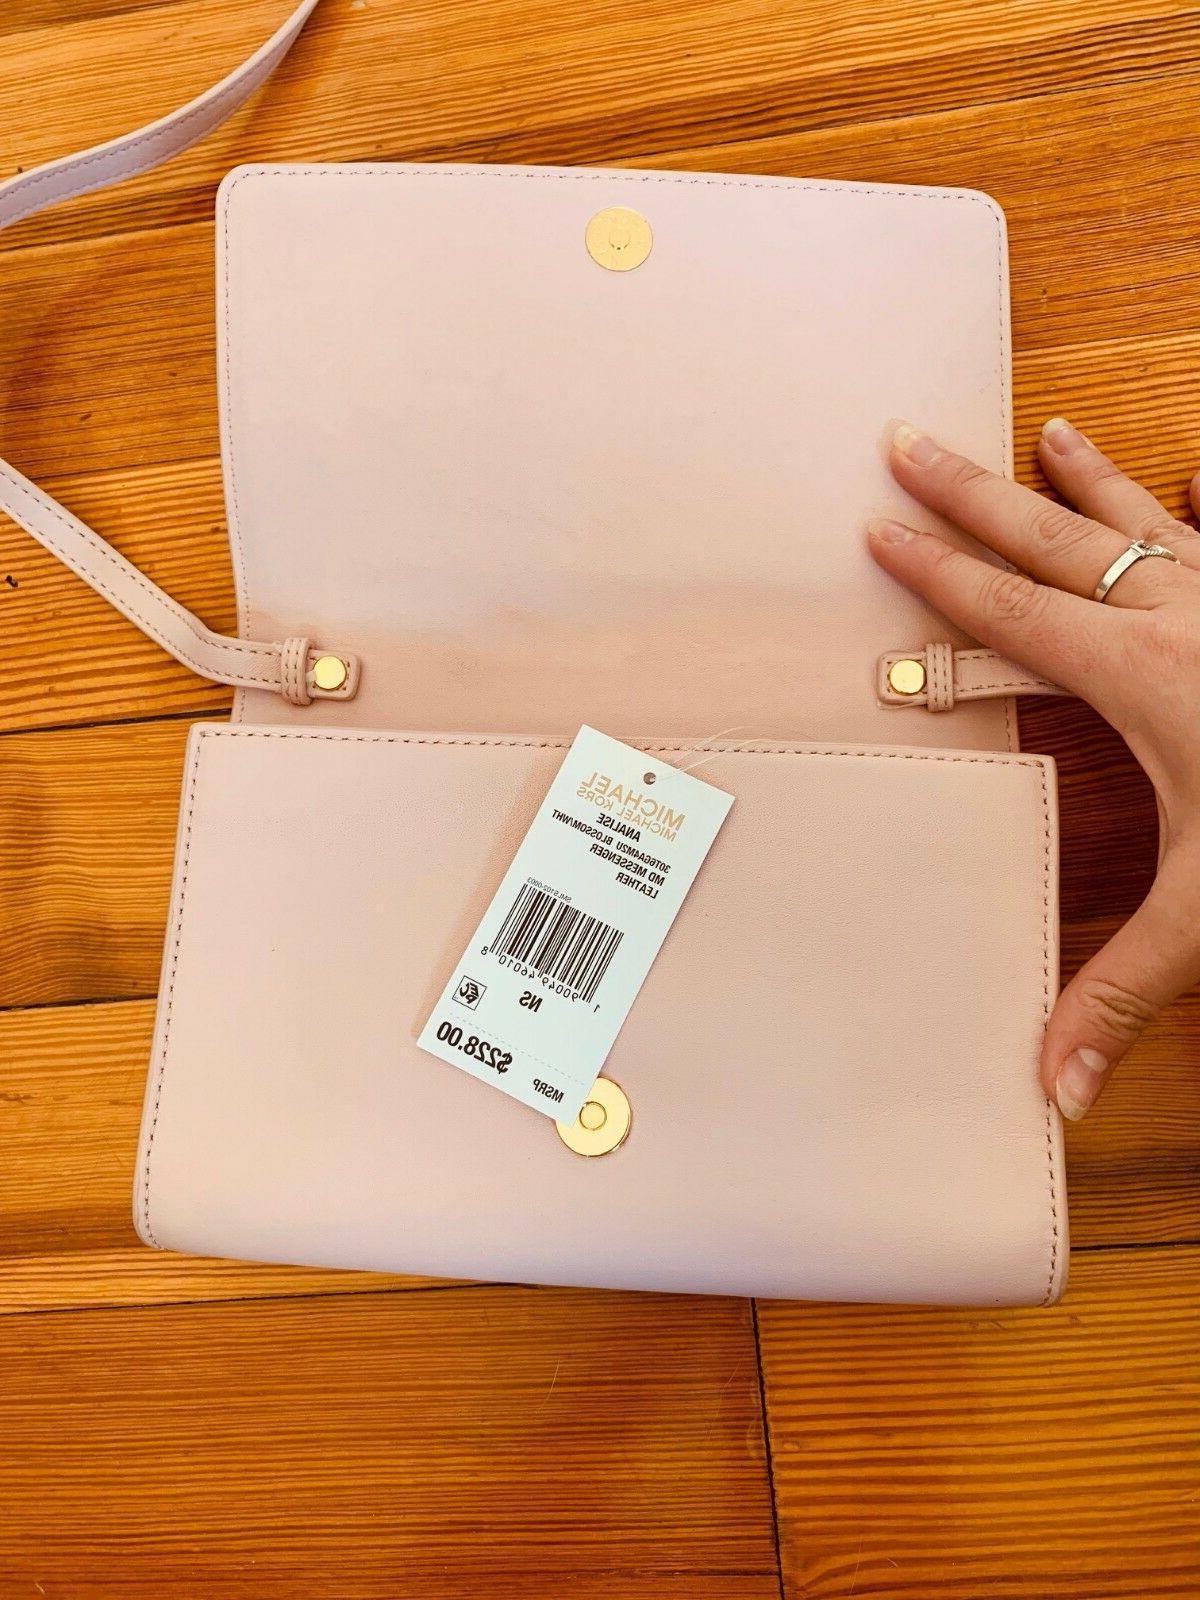 Designer Michael Kors Analise pink and crossbody purse